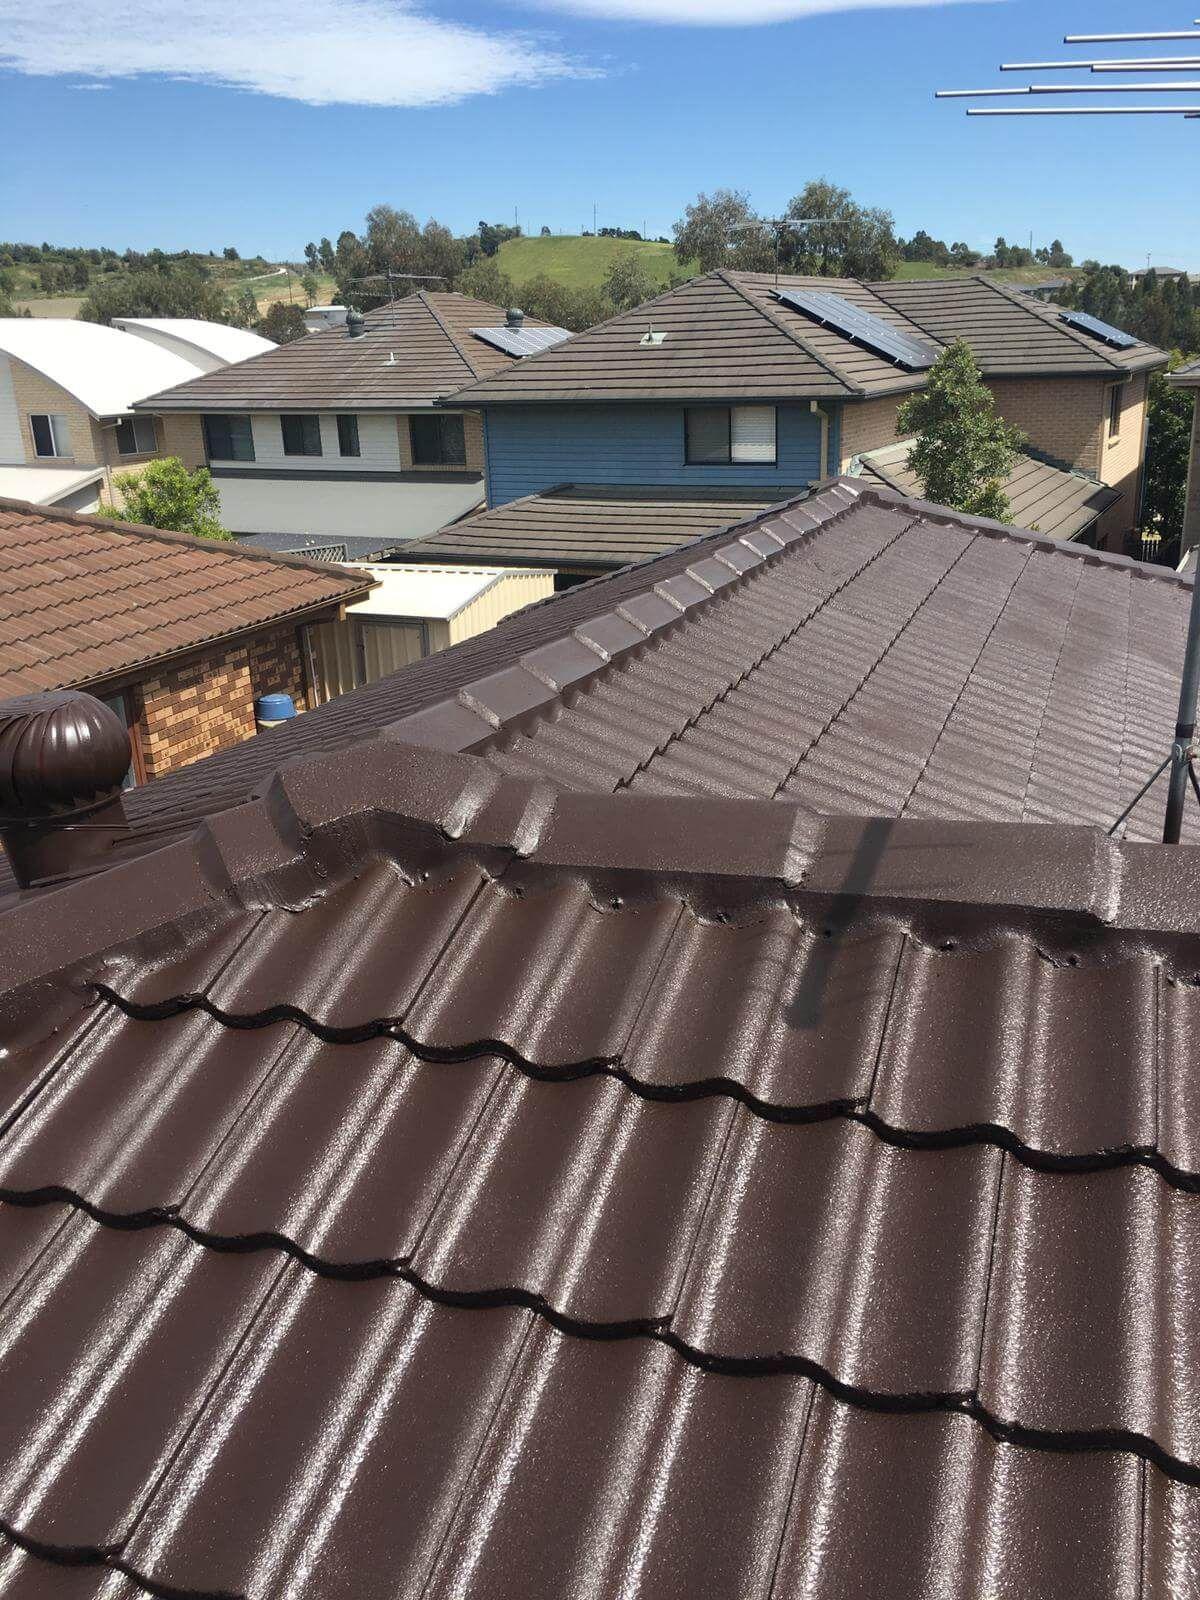 Roof Restoration Sydney In 2020 Roof Restoration Roof Renovation Roof